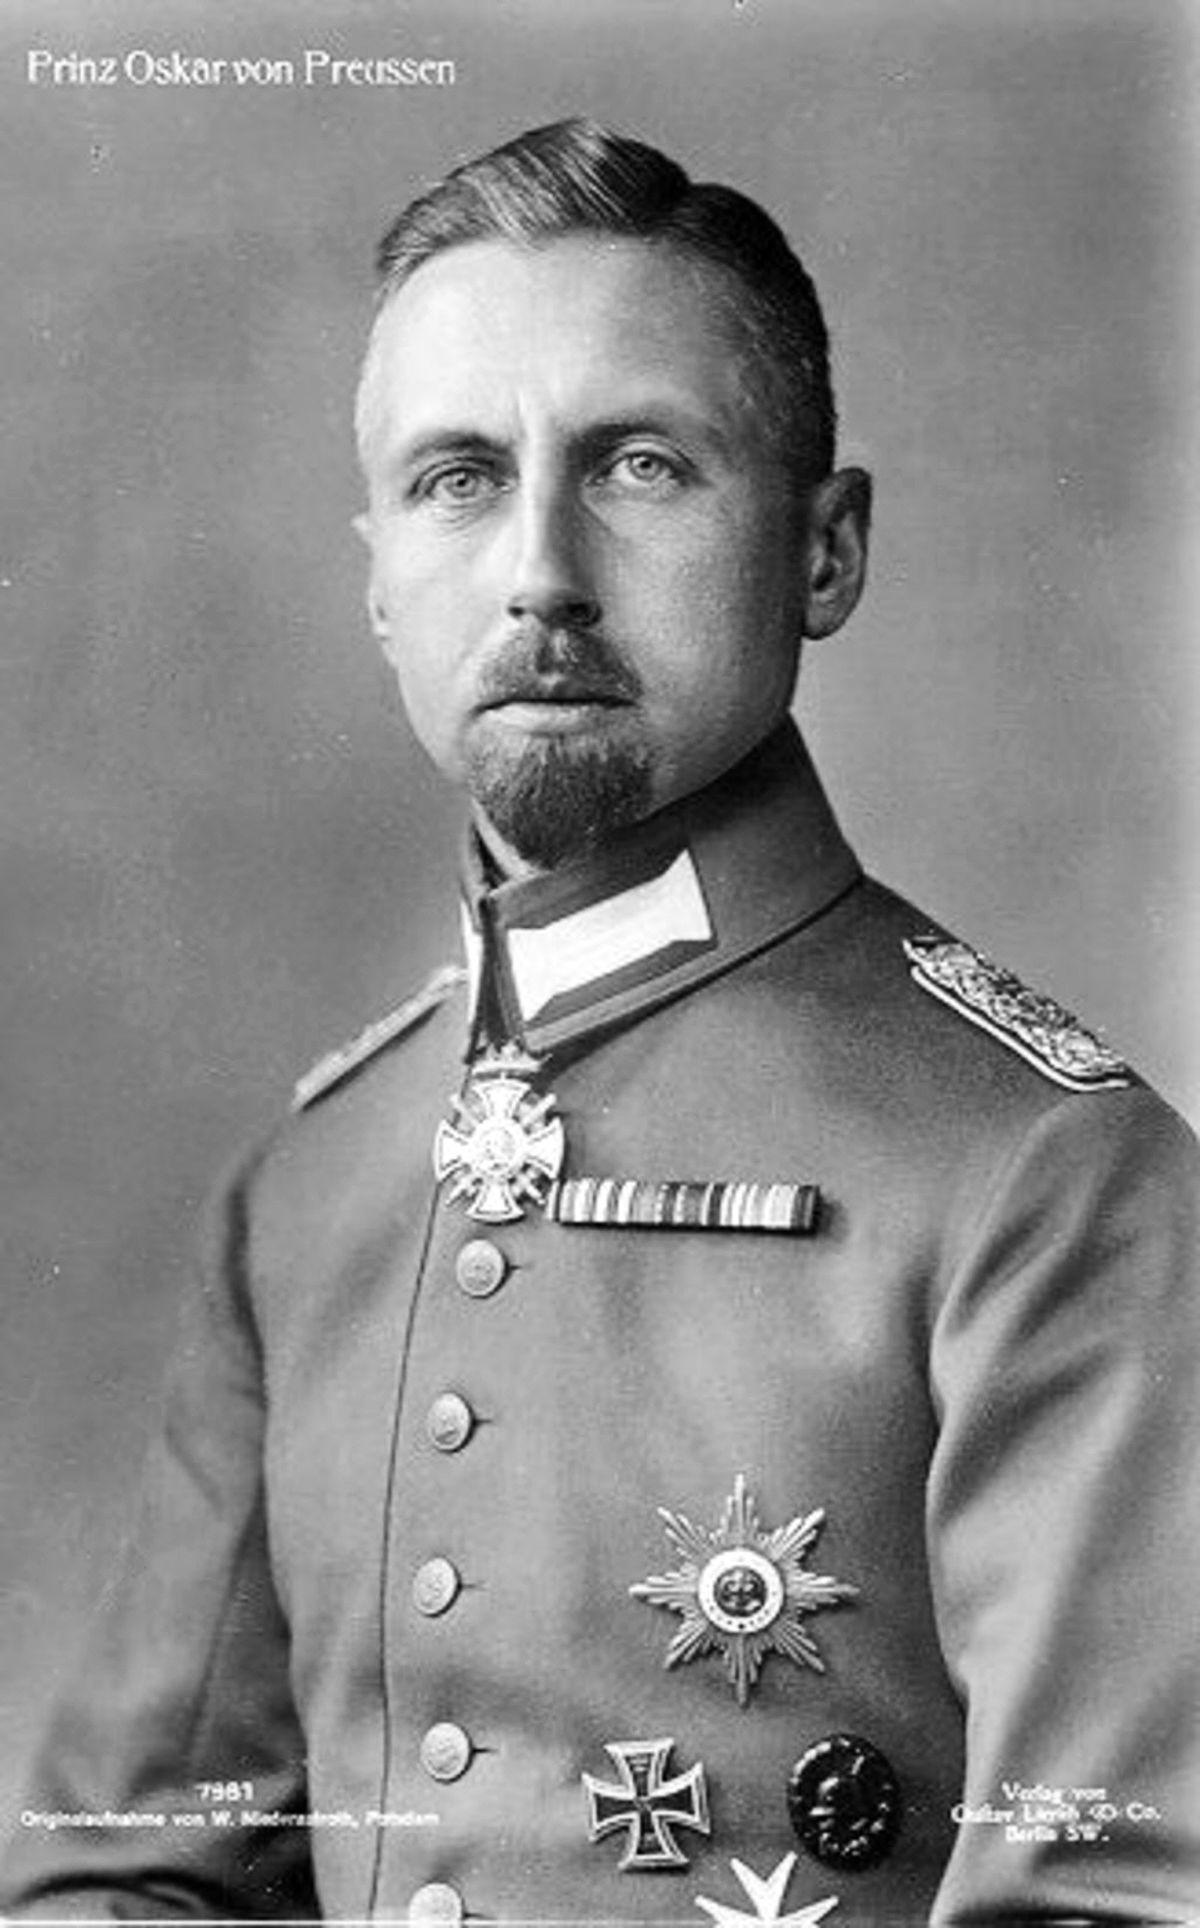 Оскар Прусский